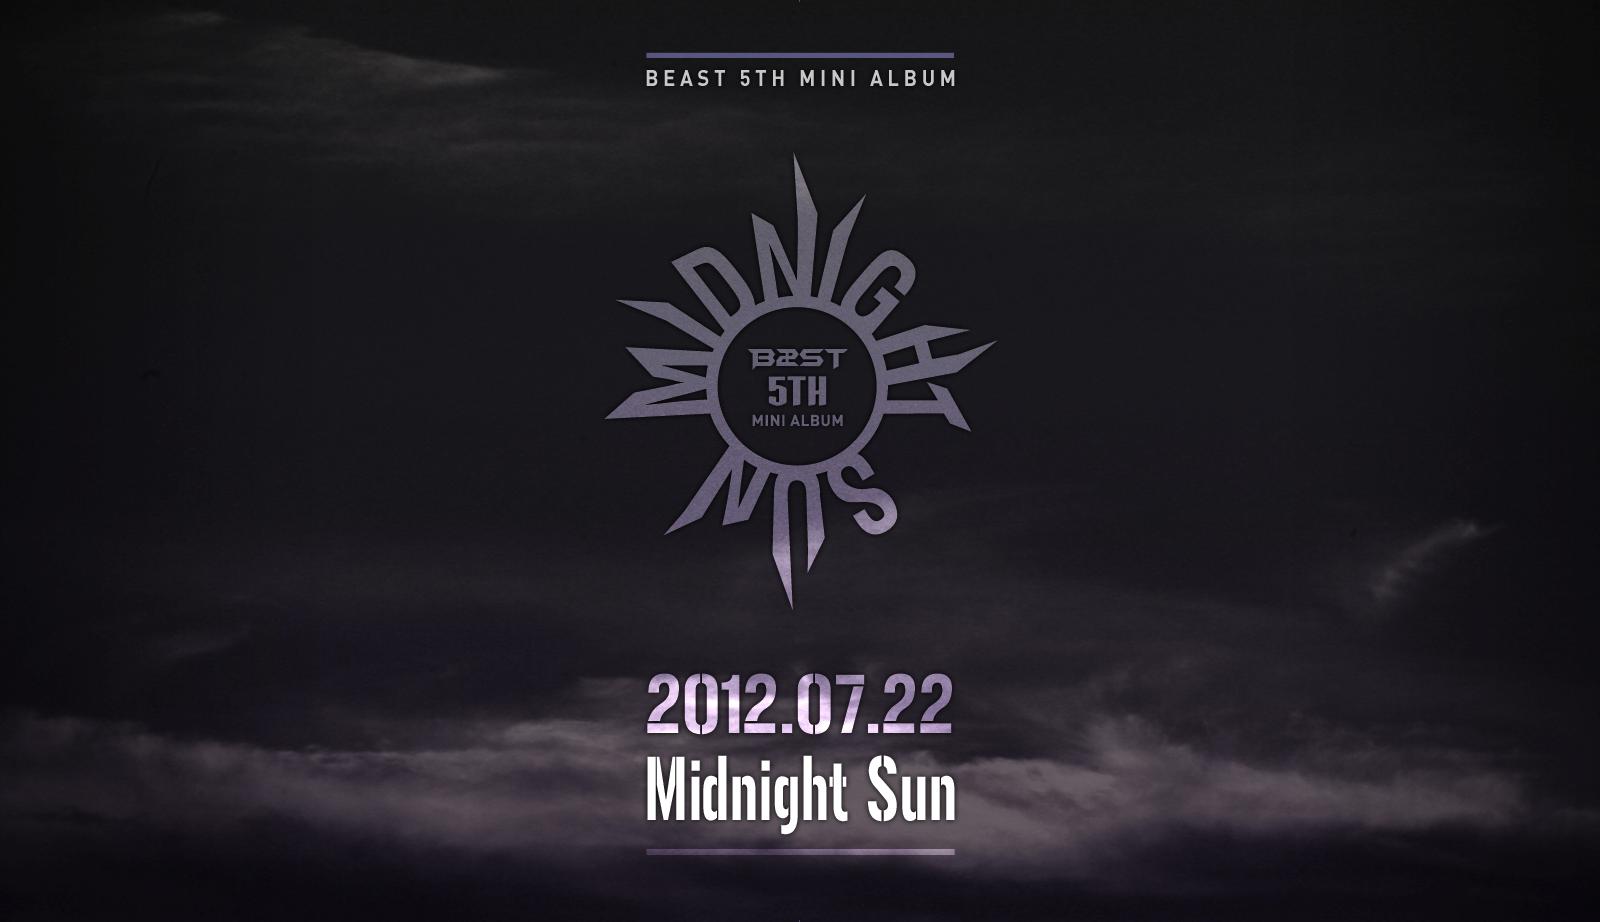 ... Midnight Sun . Stephenie Meyer New Book Midnight Sun Release Date